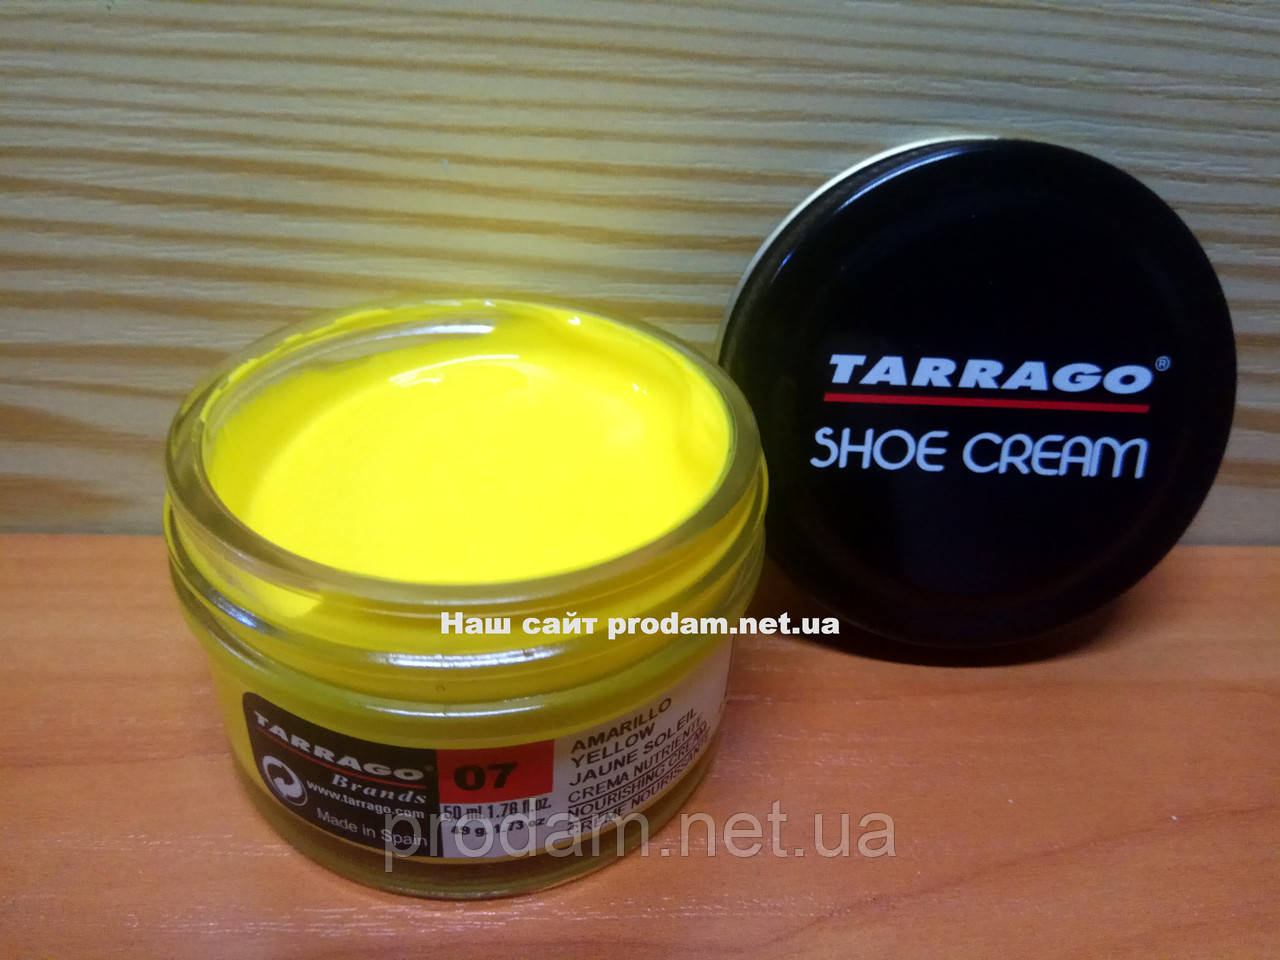 Крем для обуви Tarrago 07-giallo